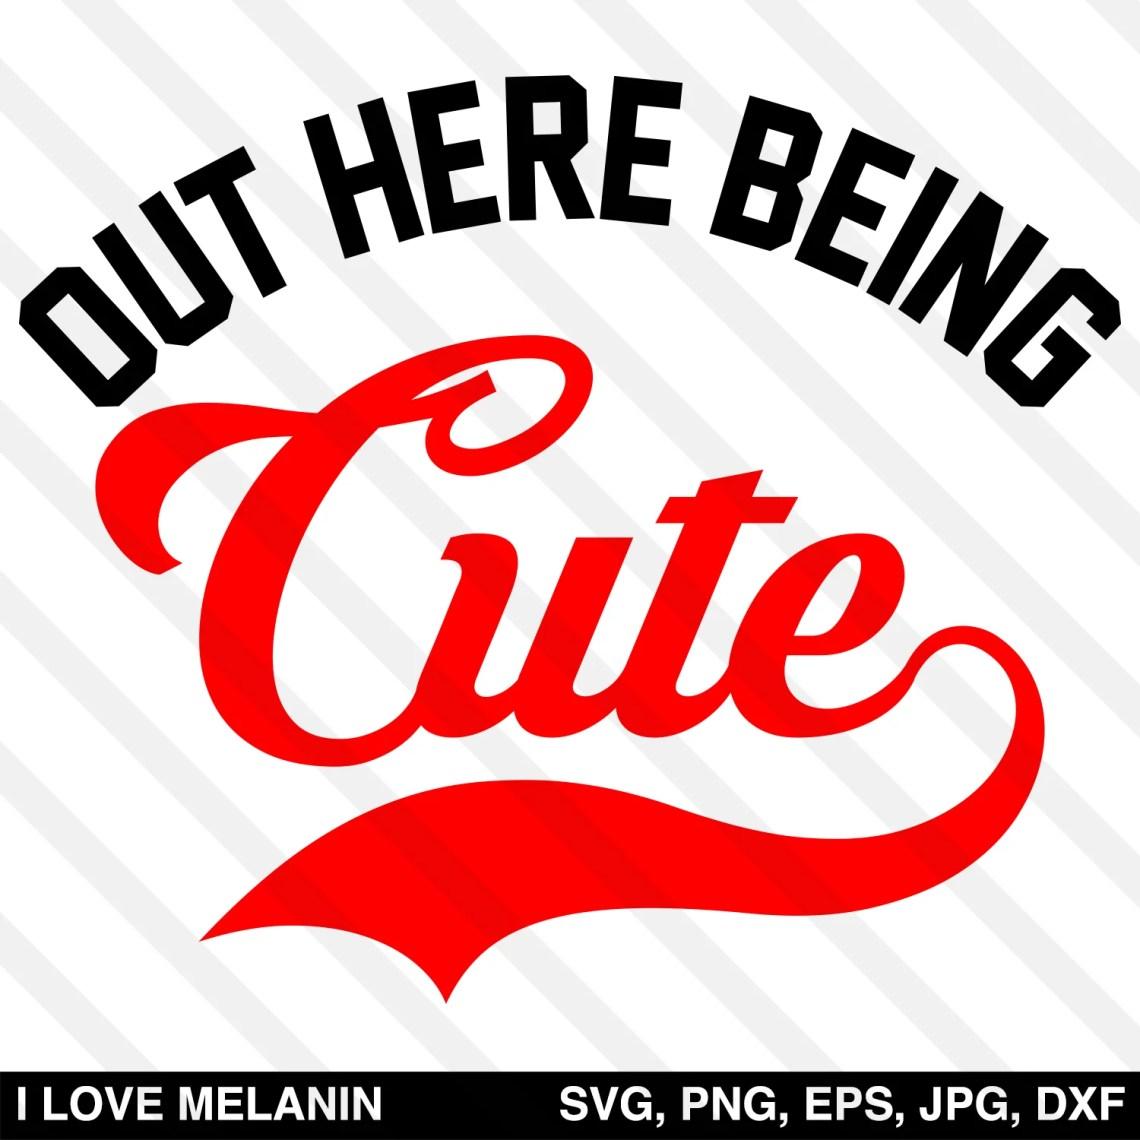 Download Cute Svg Images